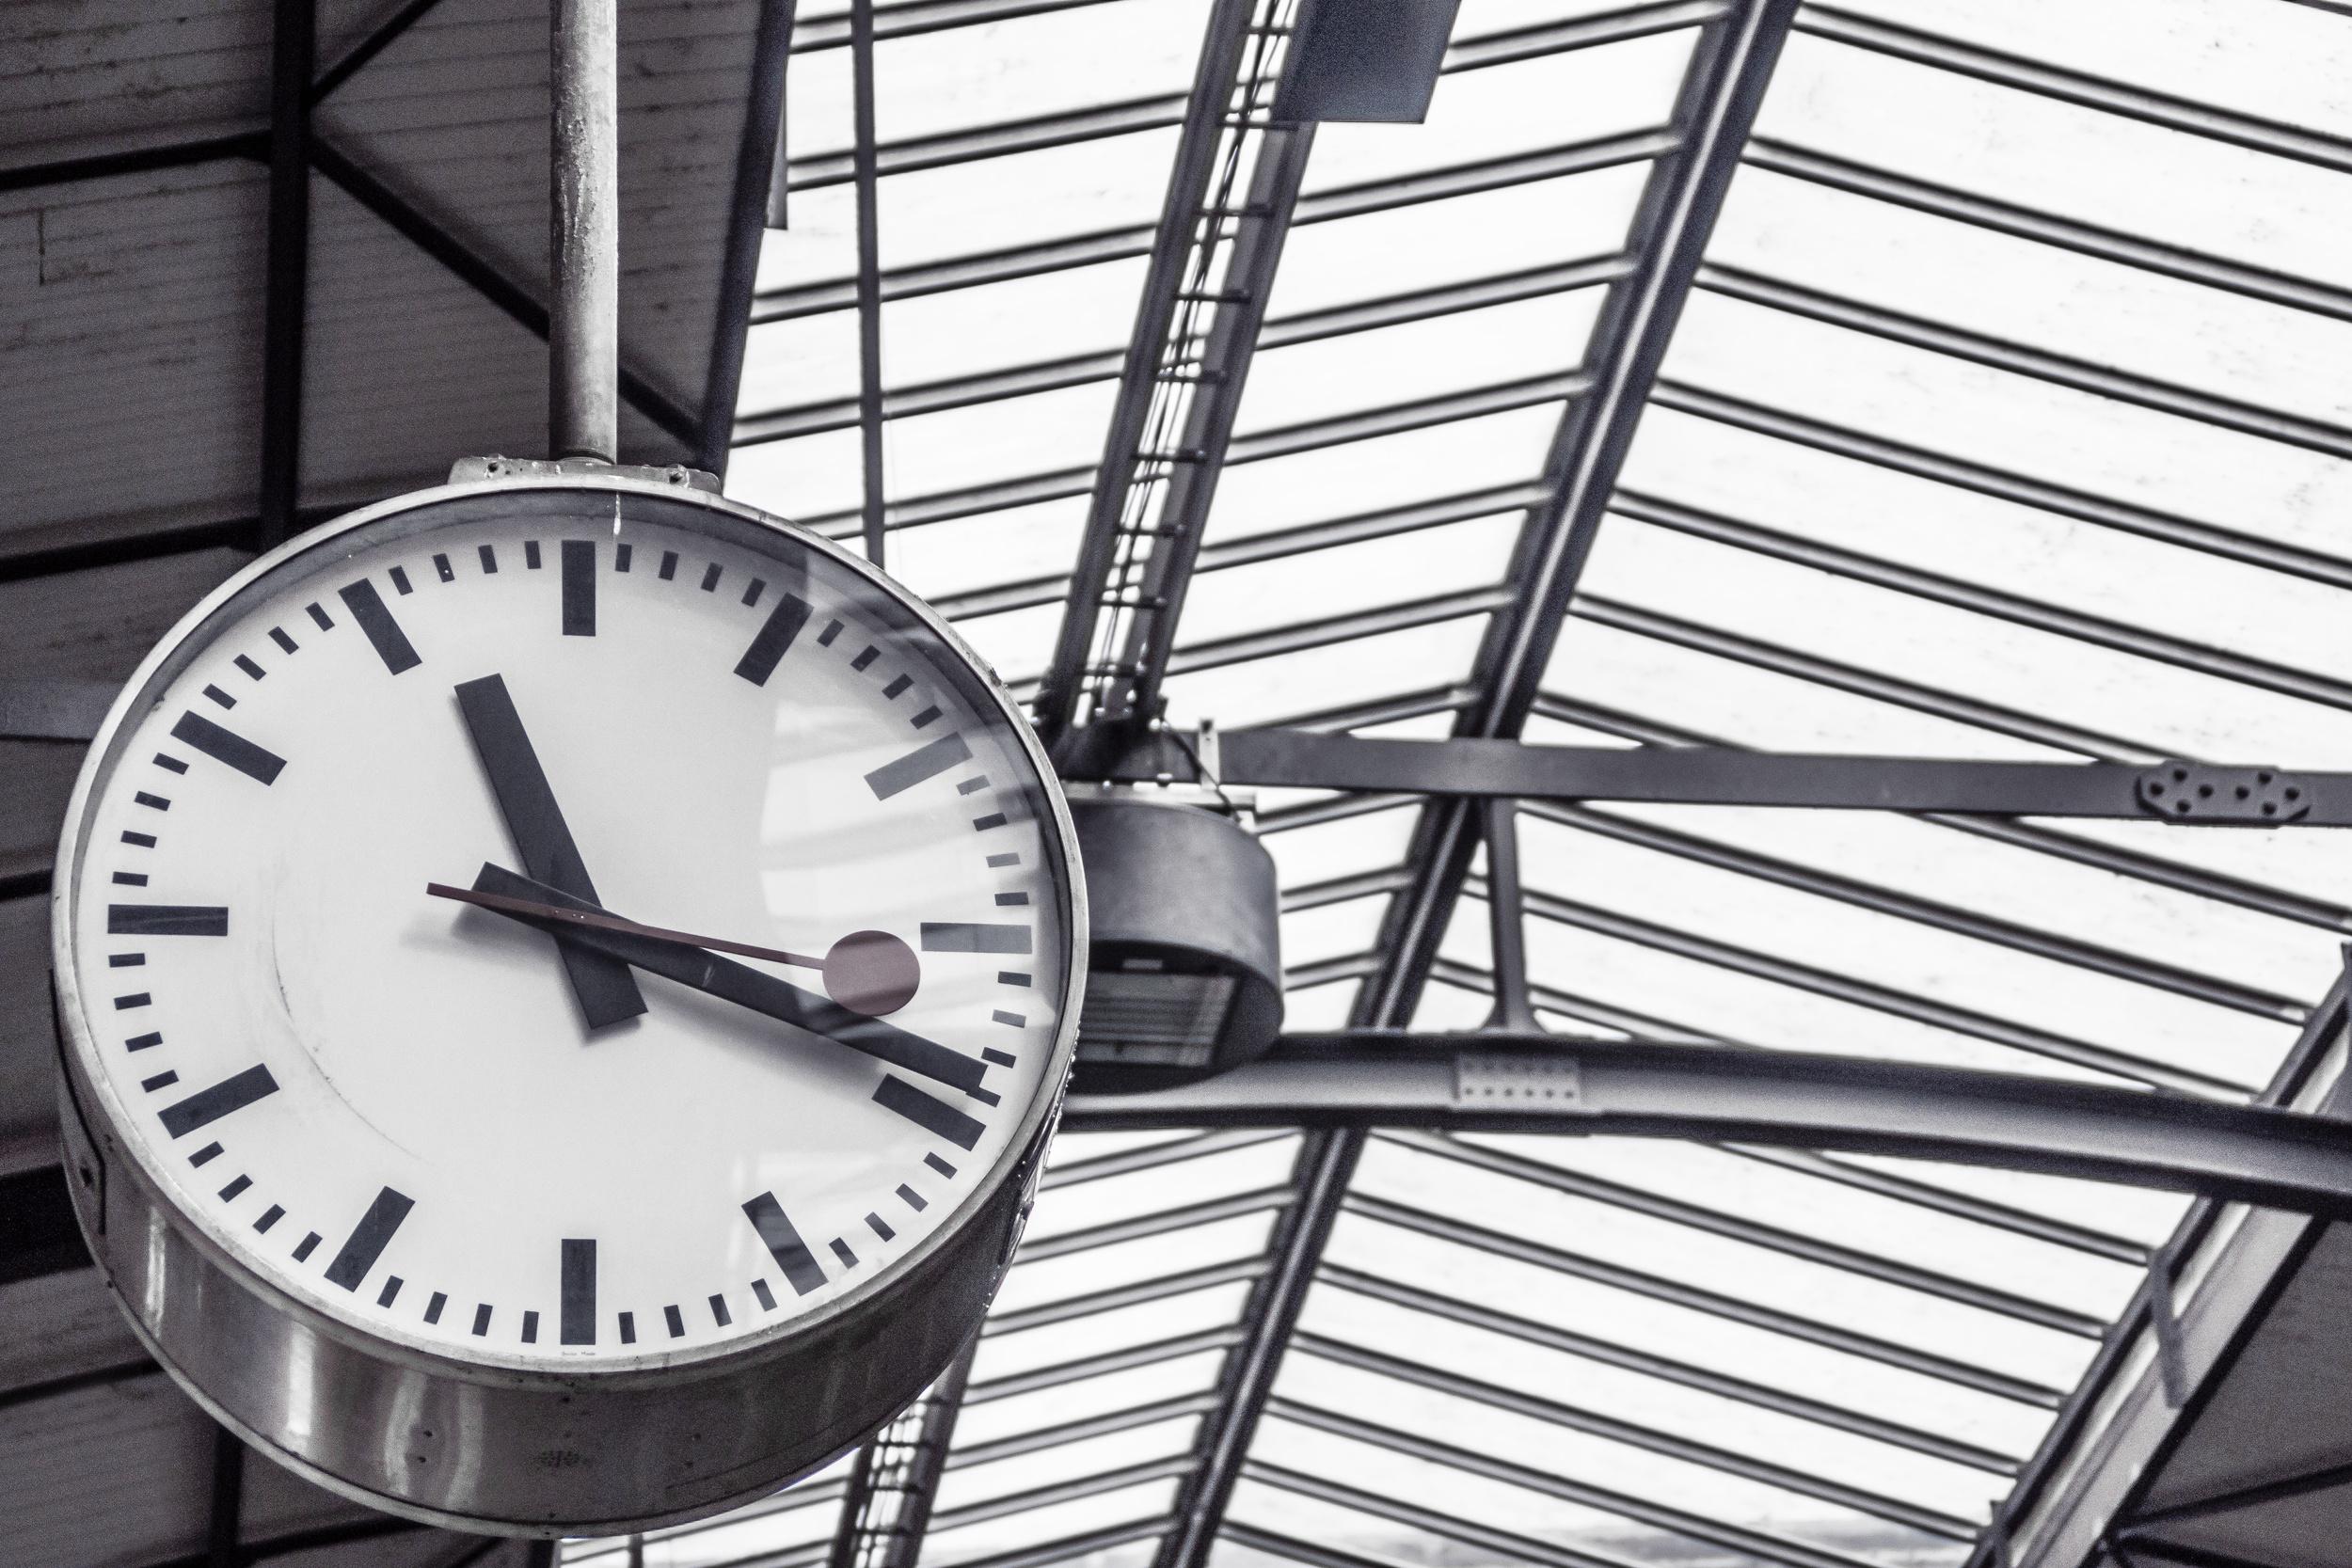 Train station analog clock